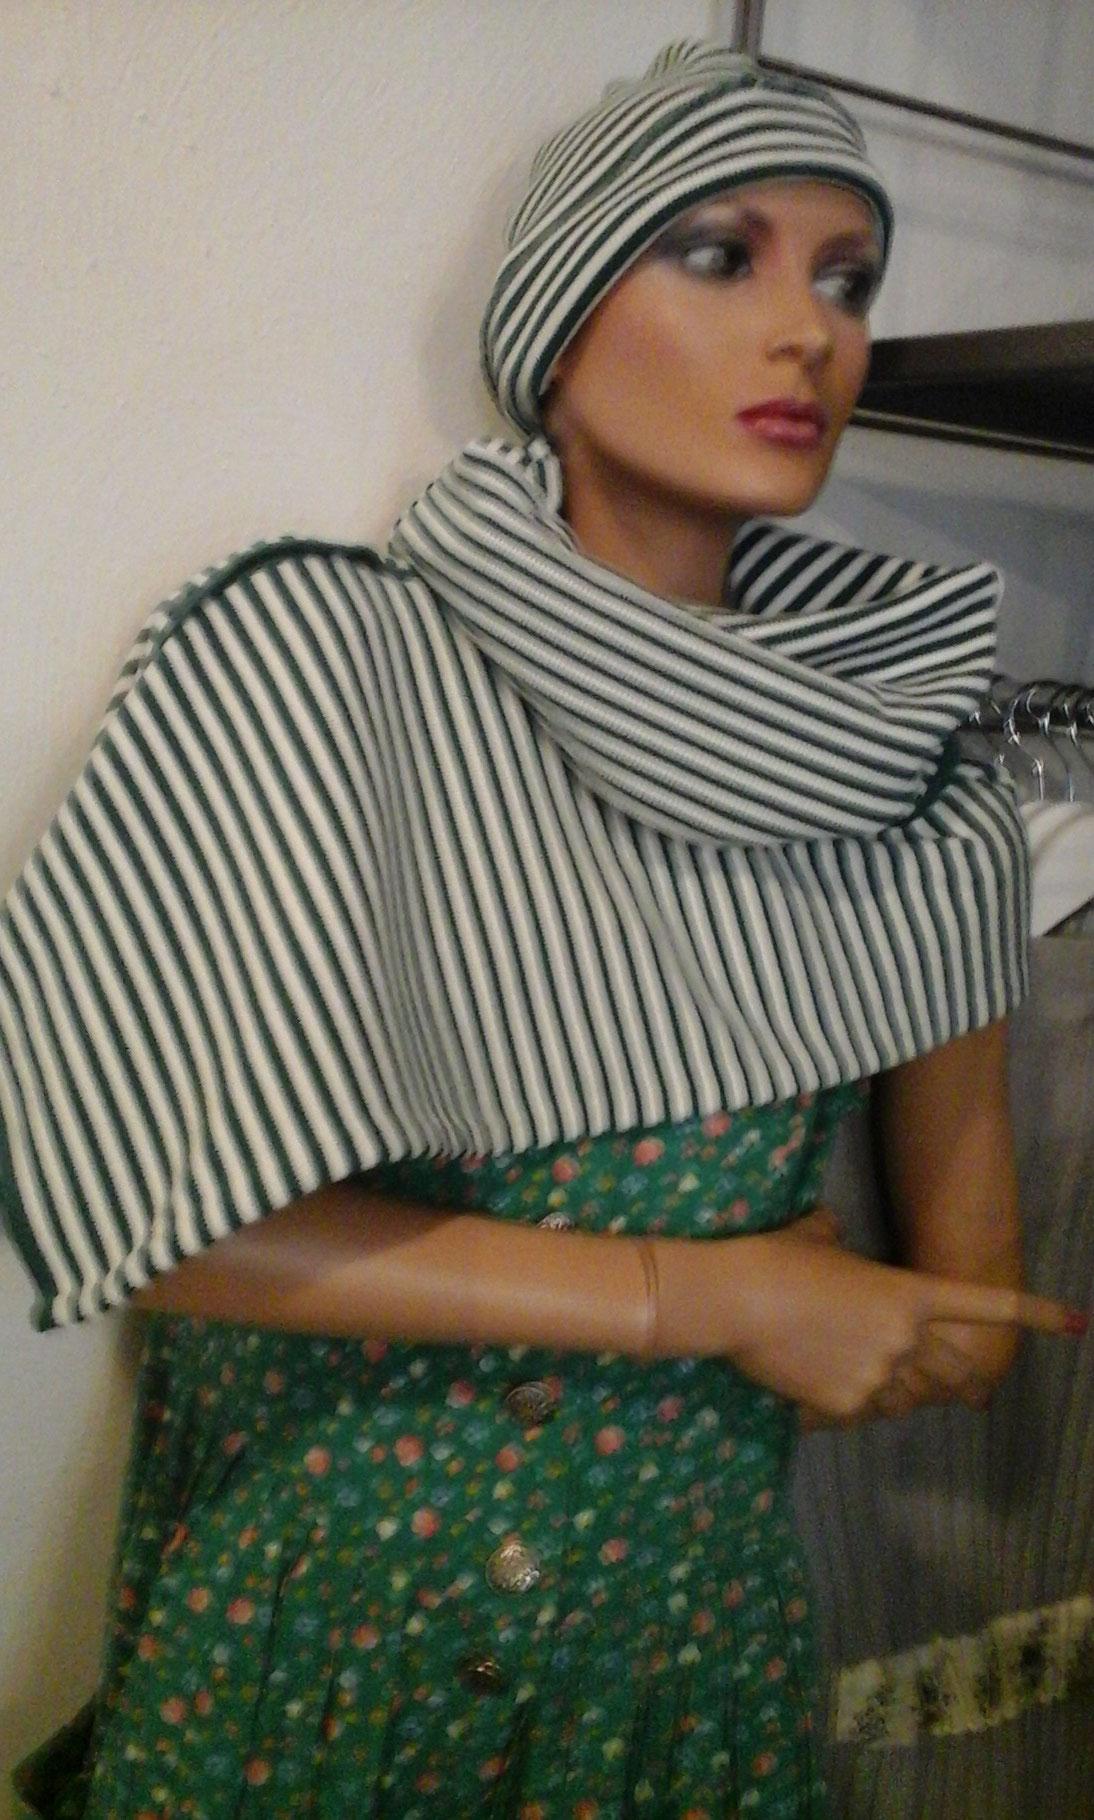 a brandnew scarf, sold, designed and made by Beate Gernhardt, Photography: Jan Gernhardt